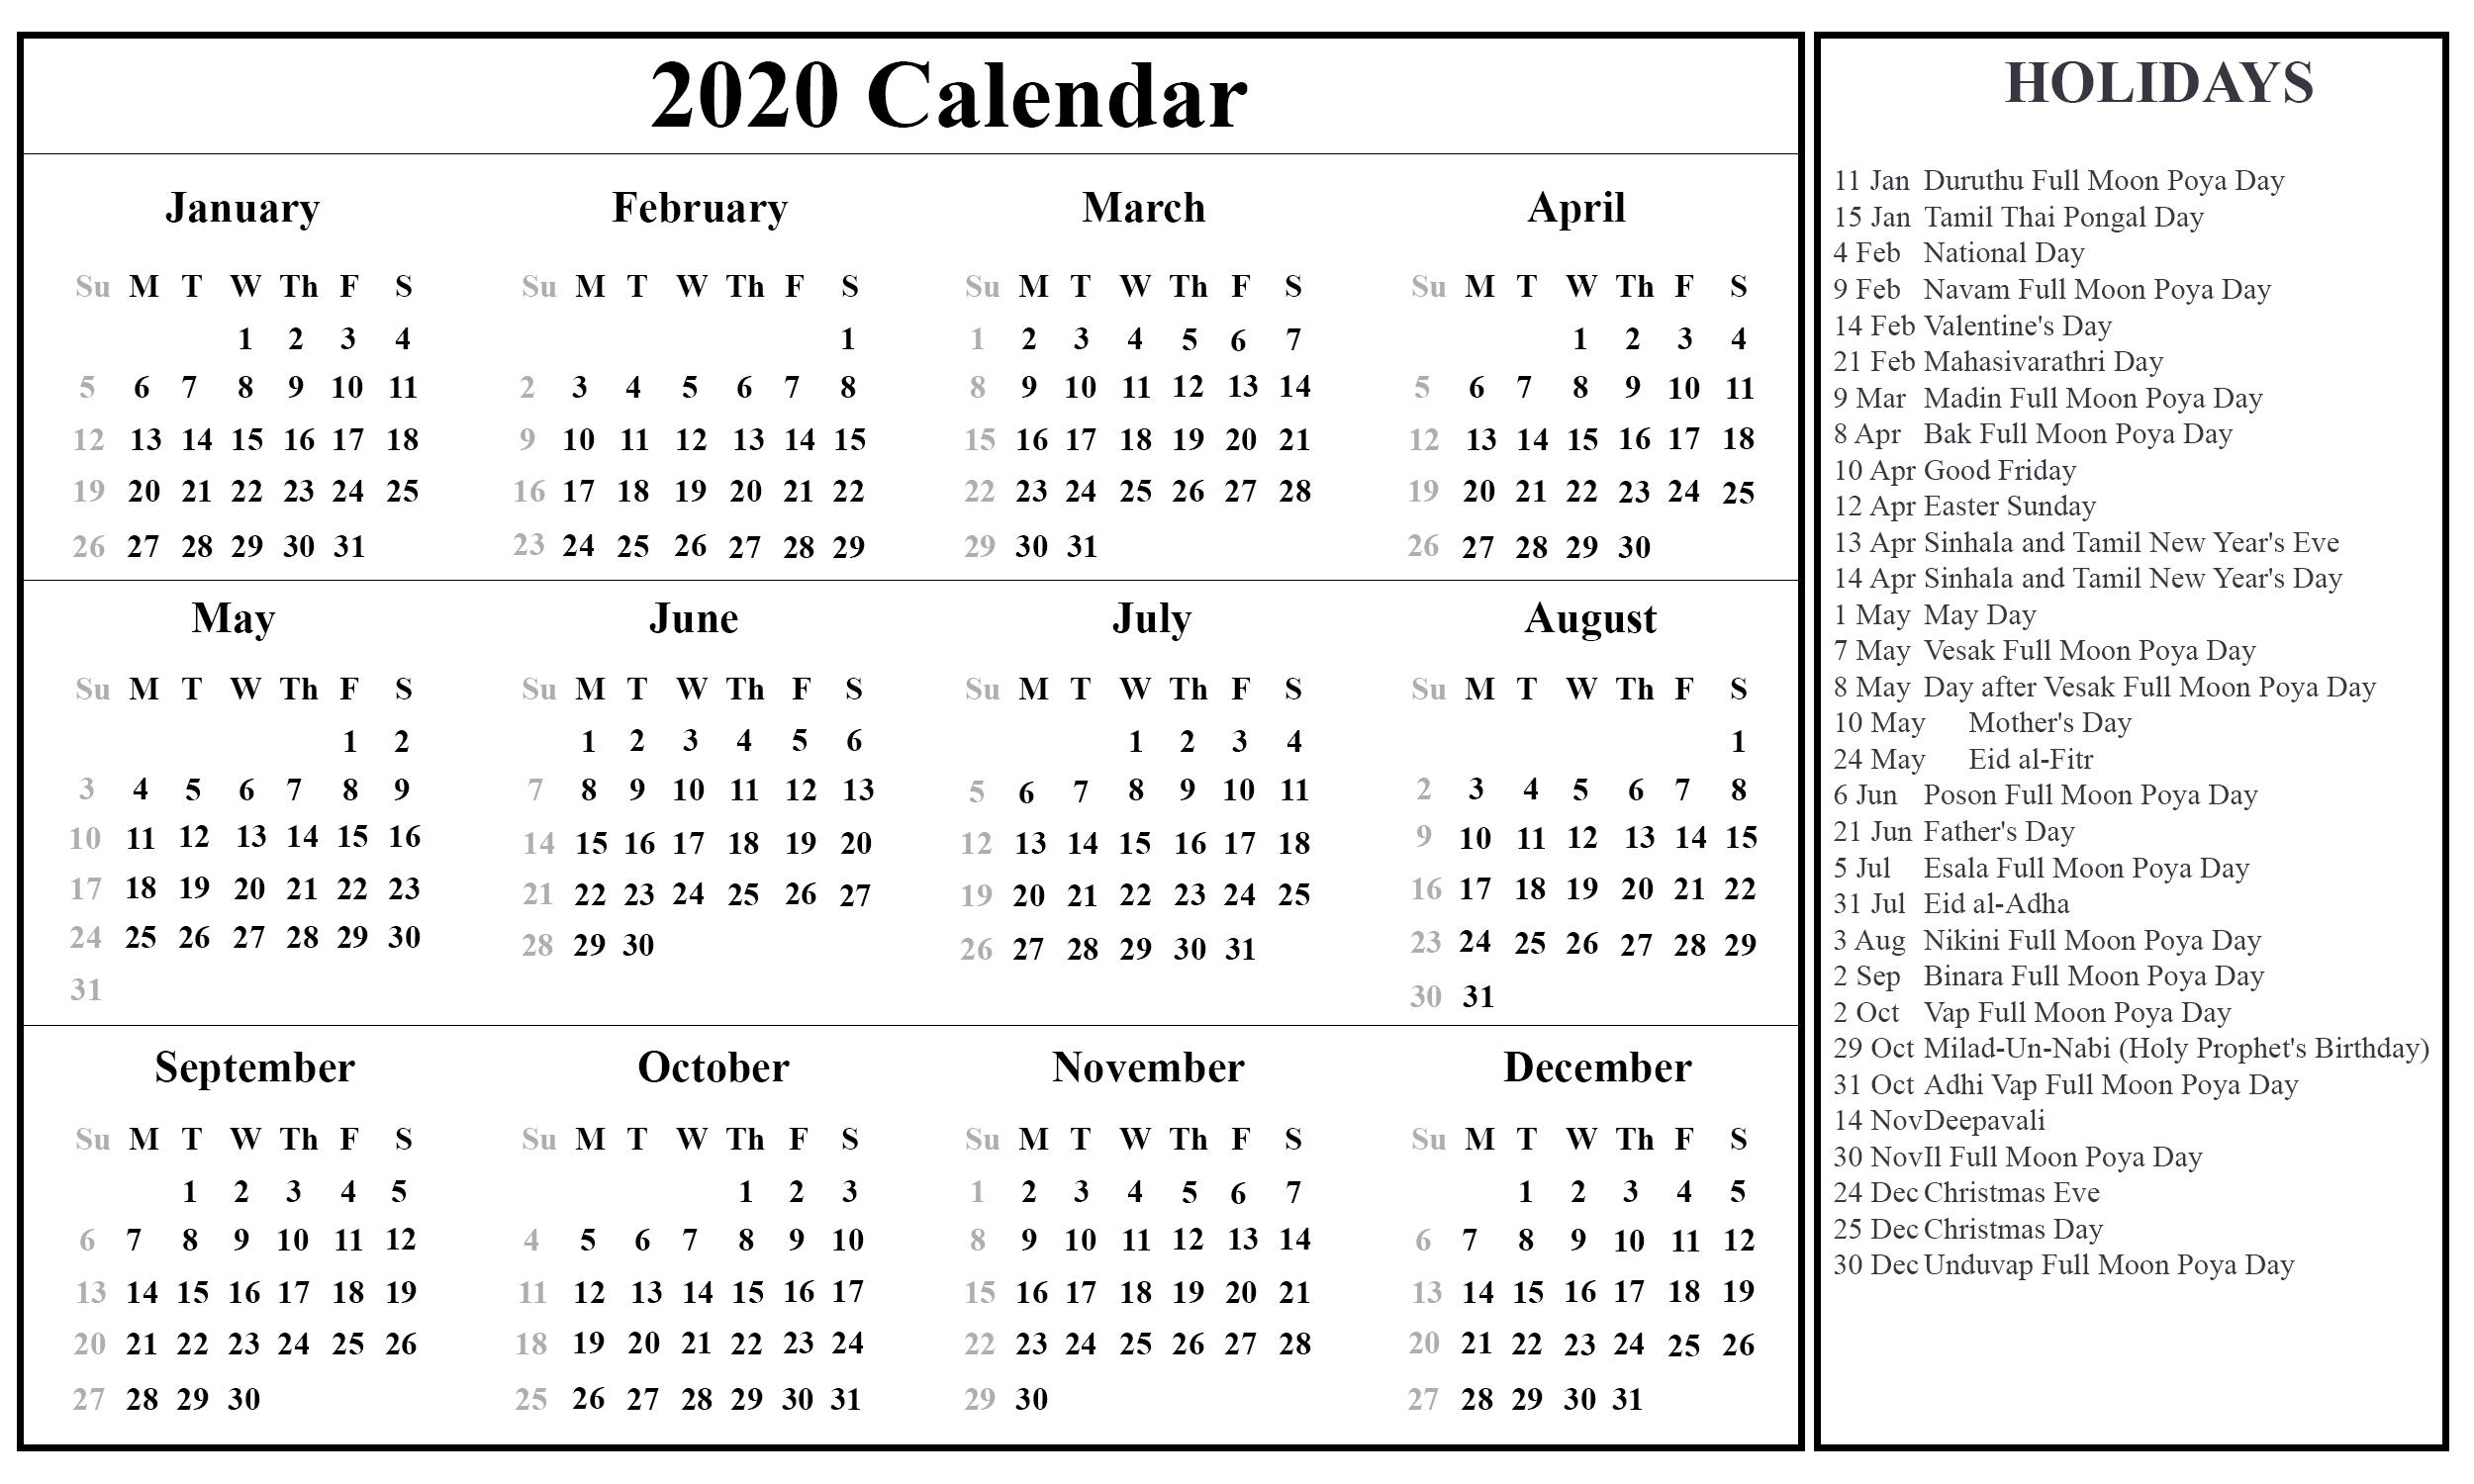 2020 Calendar Holidays